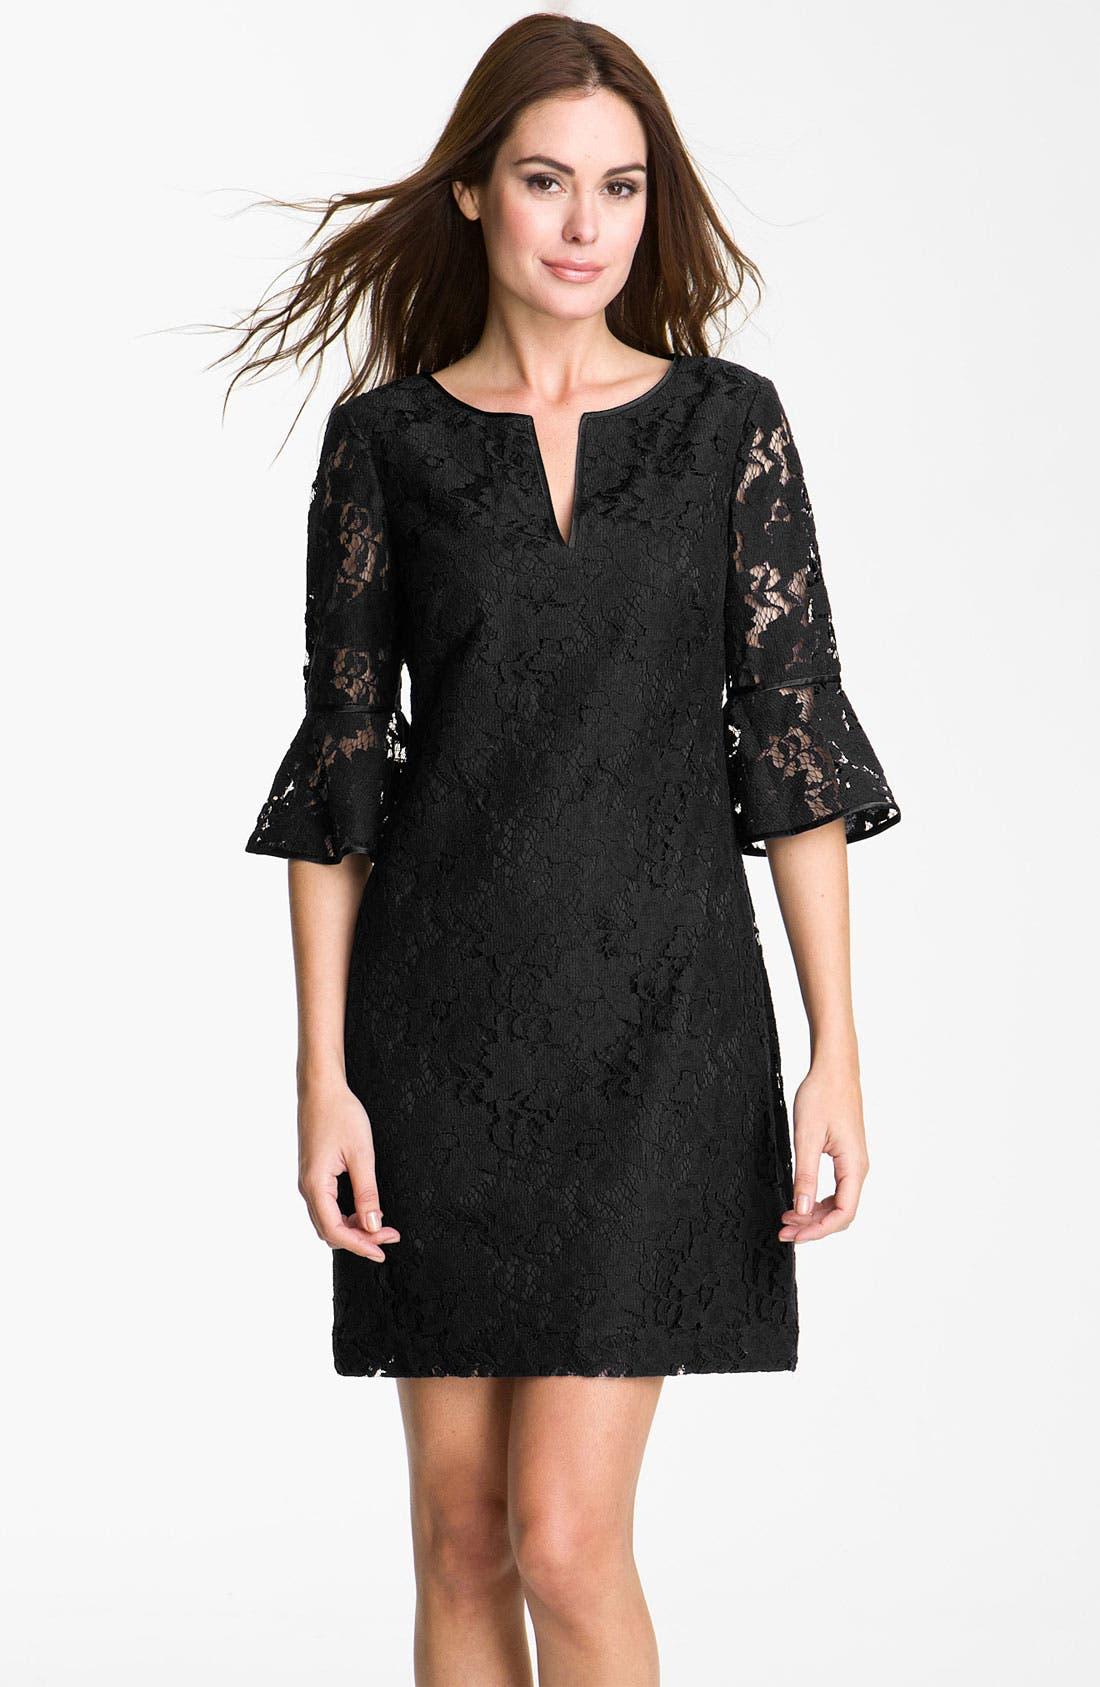 ADRIANNA PAPELL, Ruffle Sleeve Lace Dress, Main thumbnail 1, color, 001